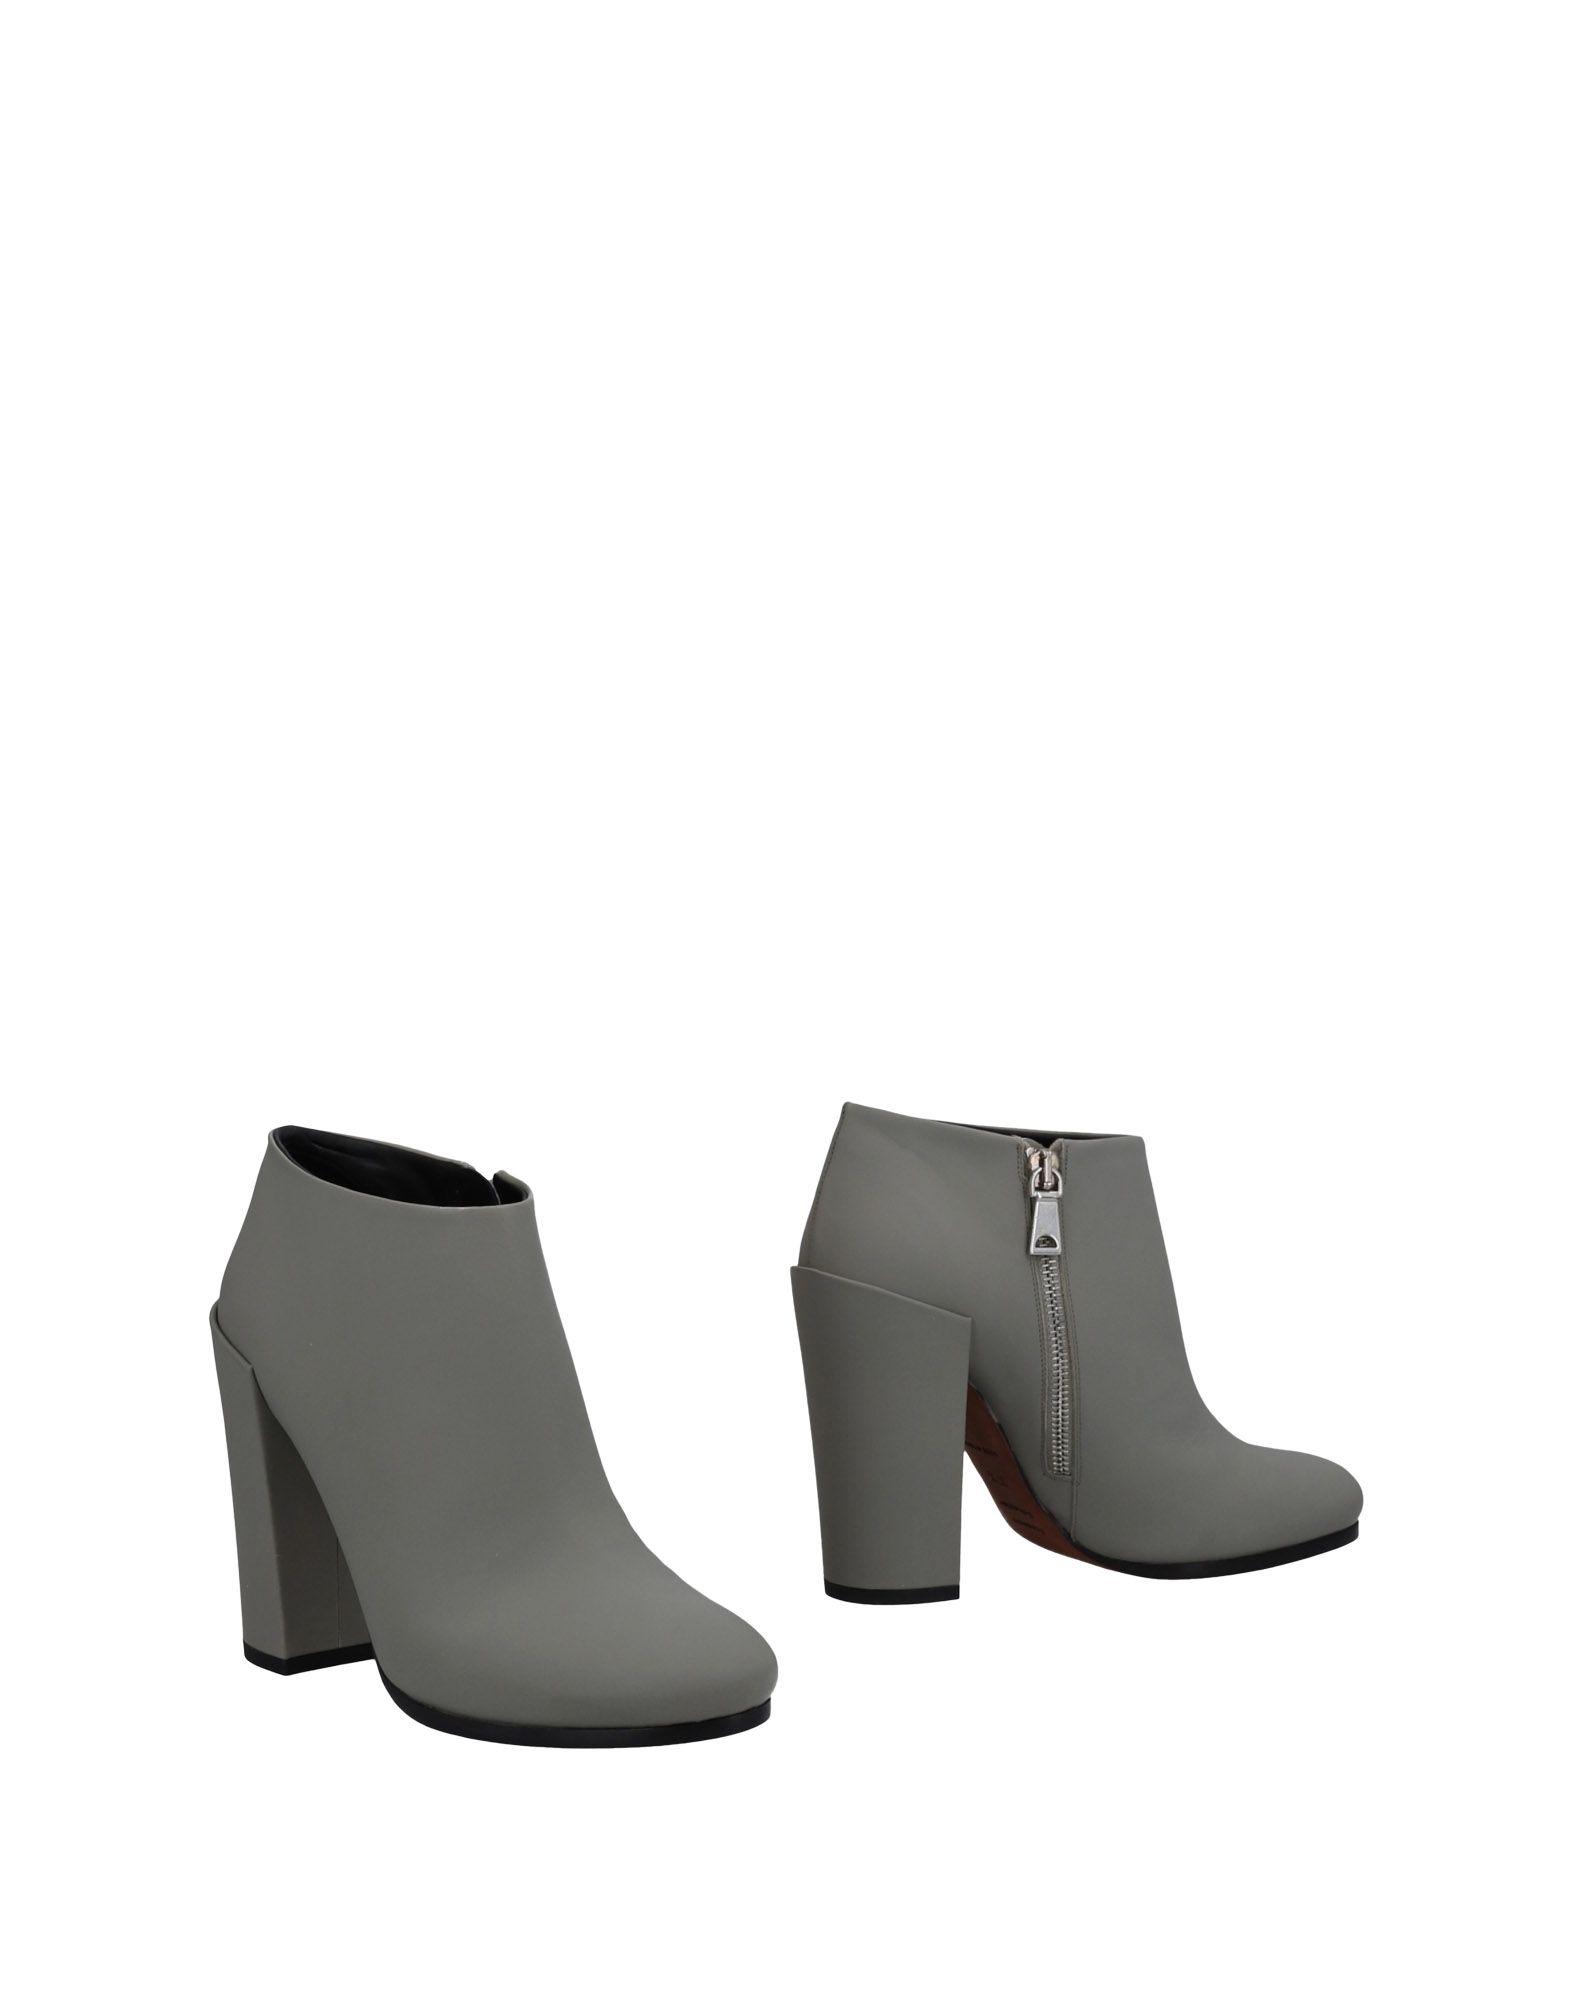 Proenza Schouler aussehende Stiefelette Damen  11488850VCGut aussehende Schouler strapazierfähige Schuhe 4ec619